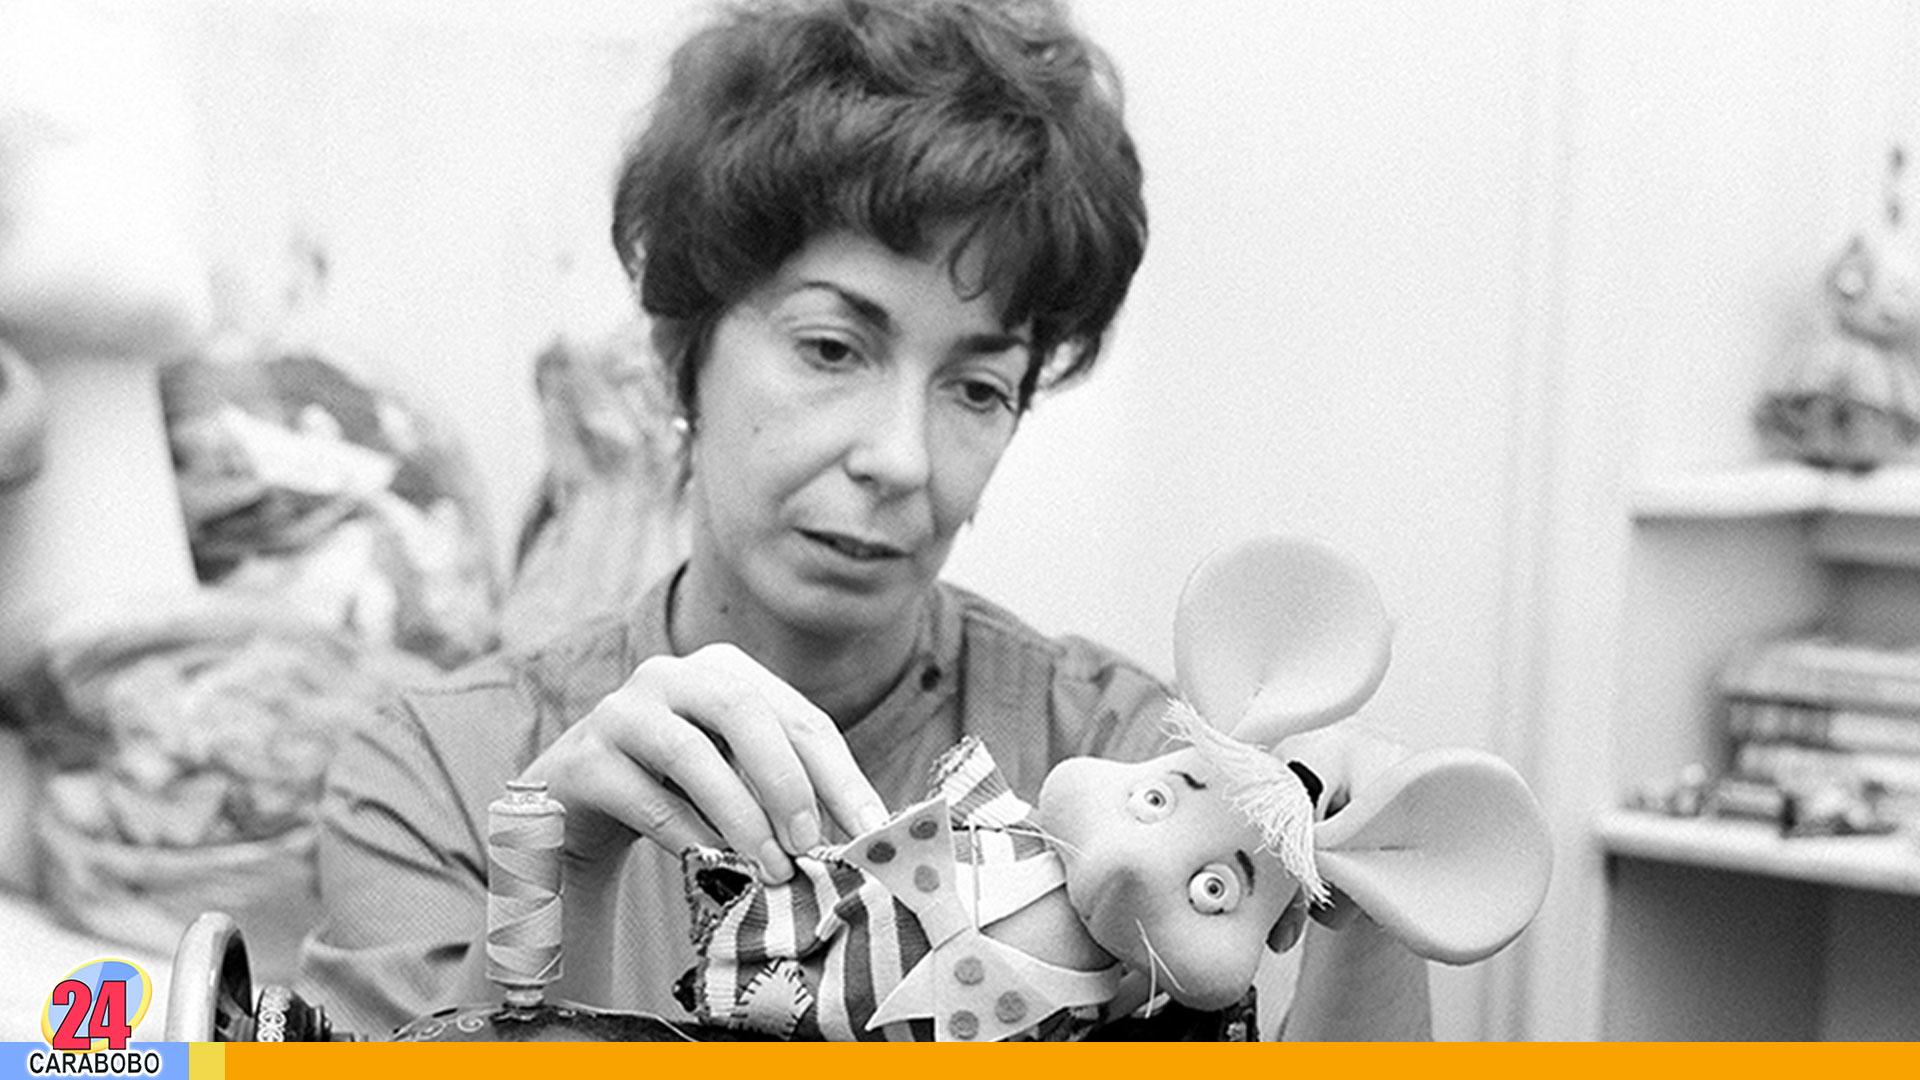 creadora del Topo Gigio - Creadora del Topo Gigio